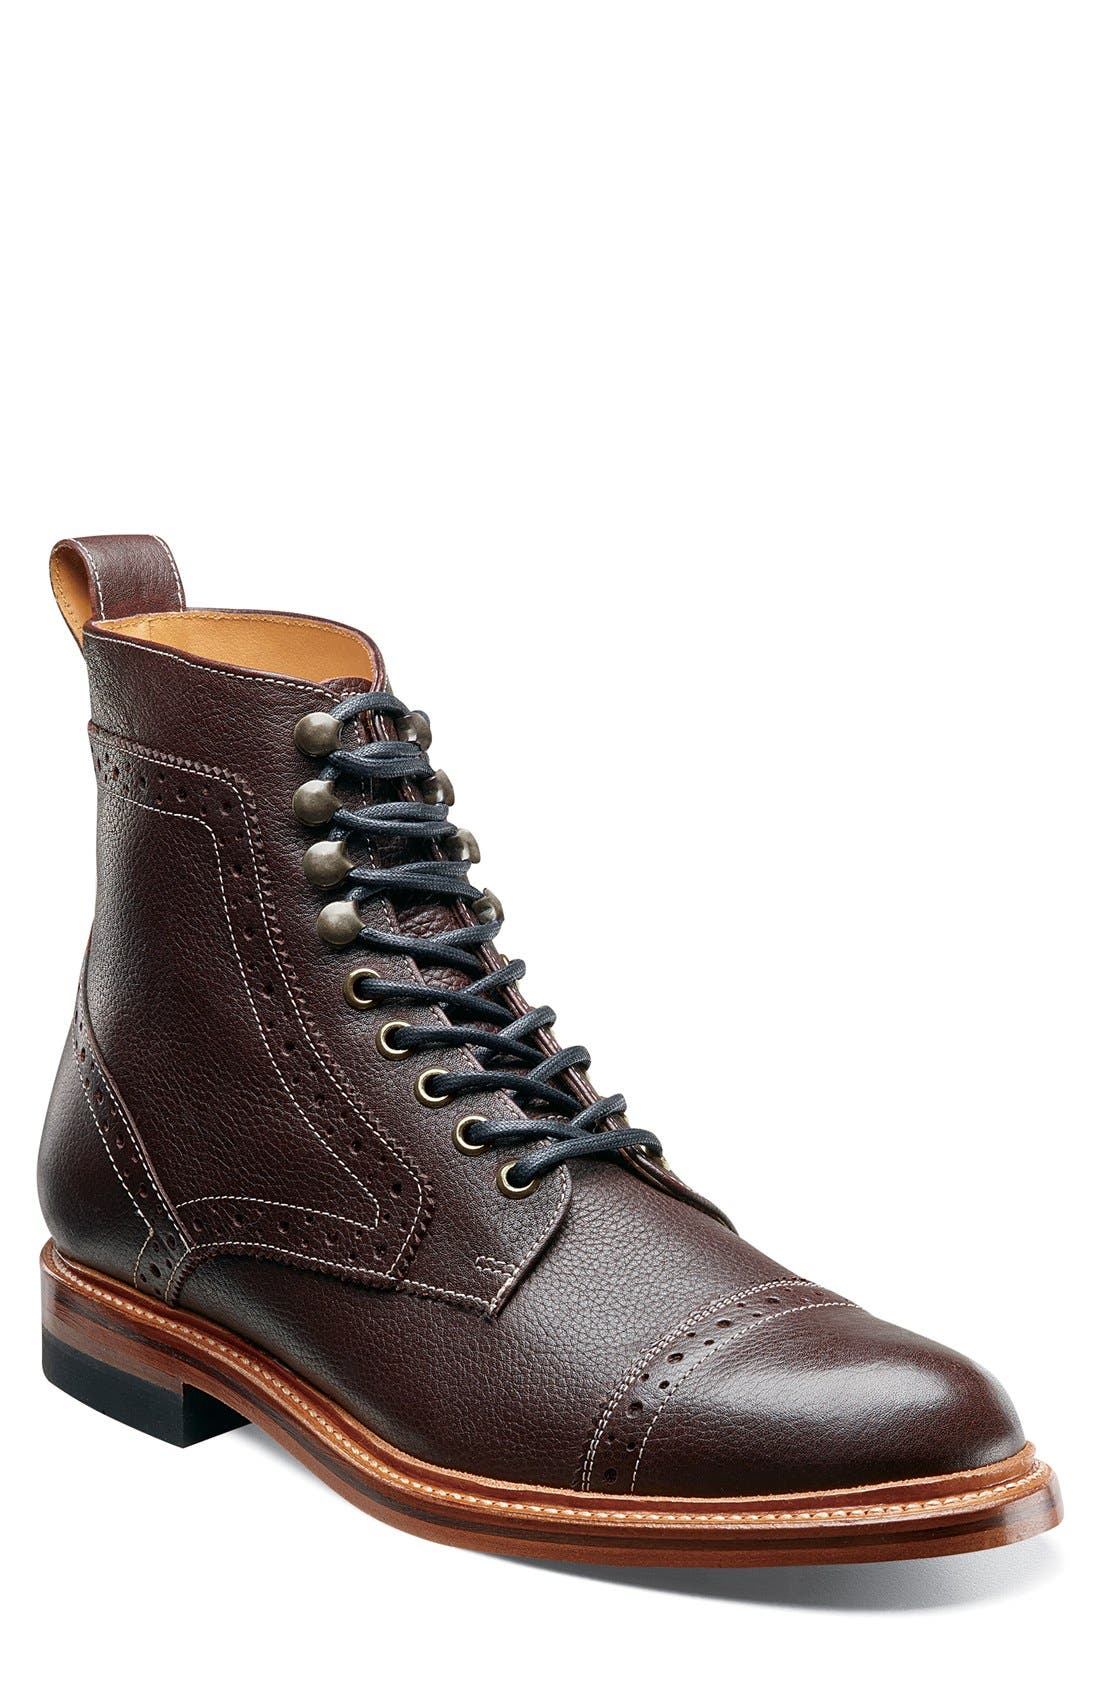 Alternate Image 1 Selected - Stacy Adams Madison II Cap Toe Boot (Men)